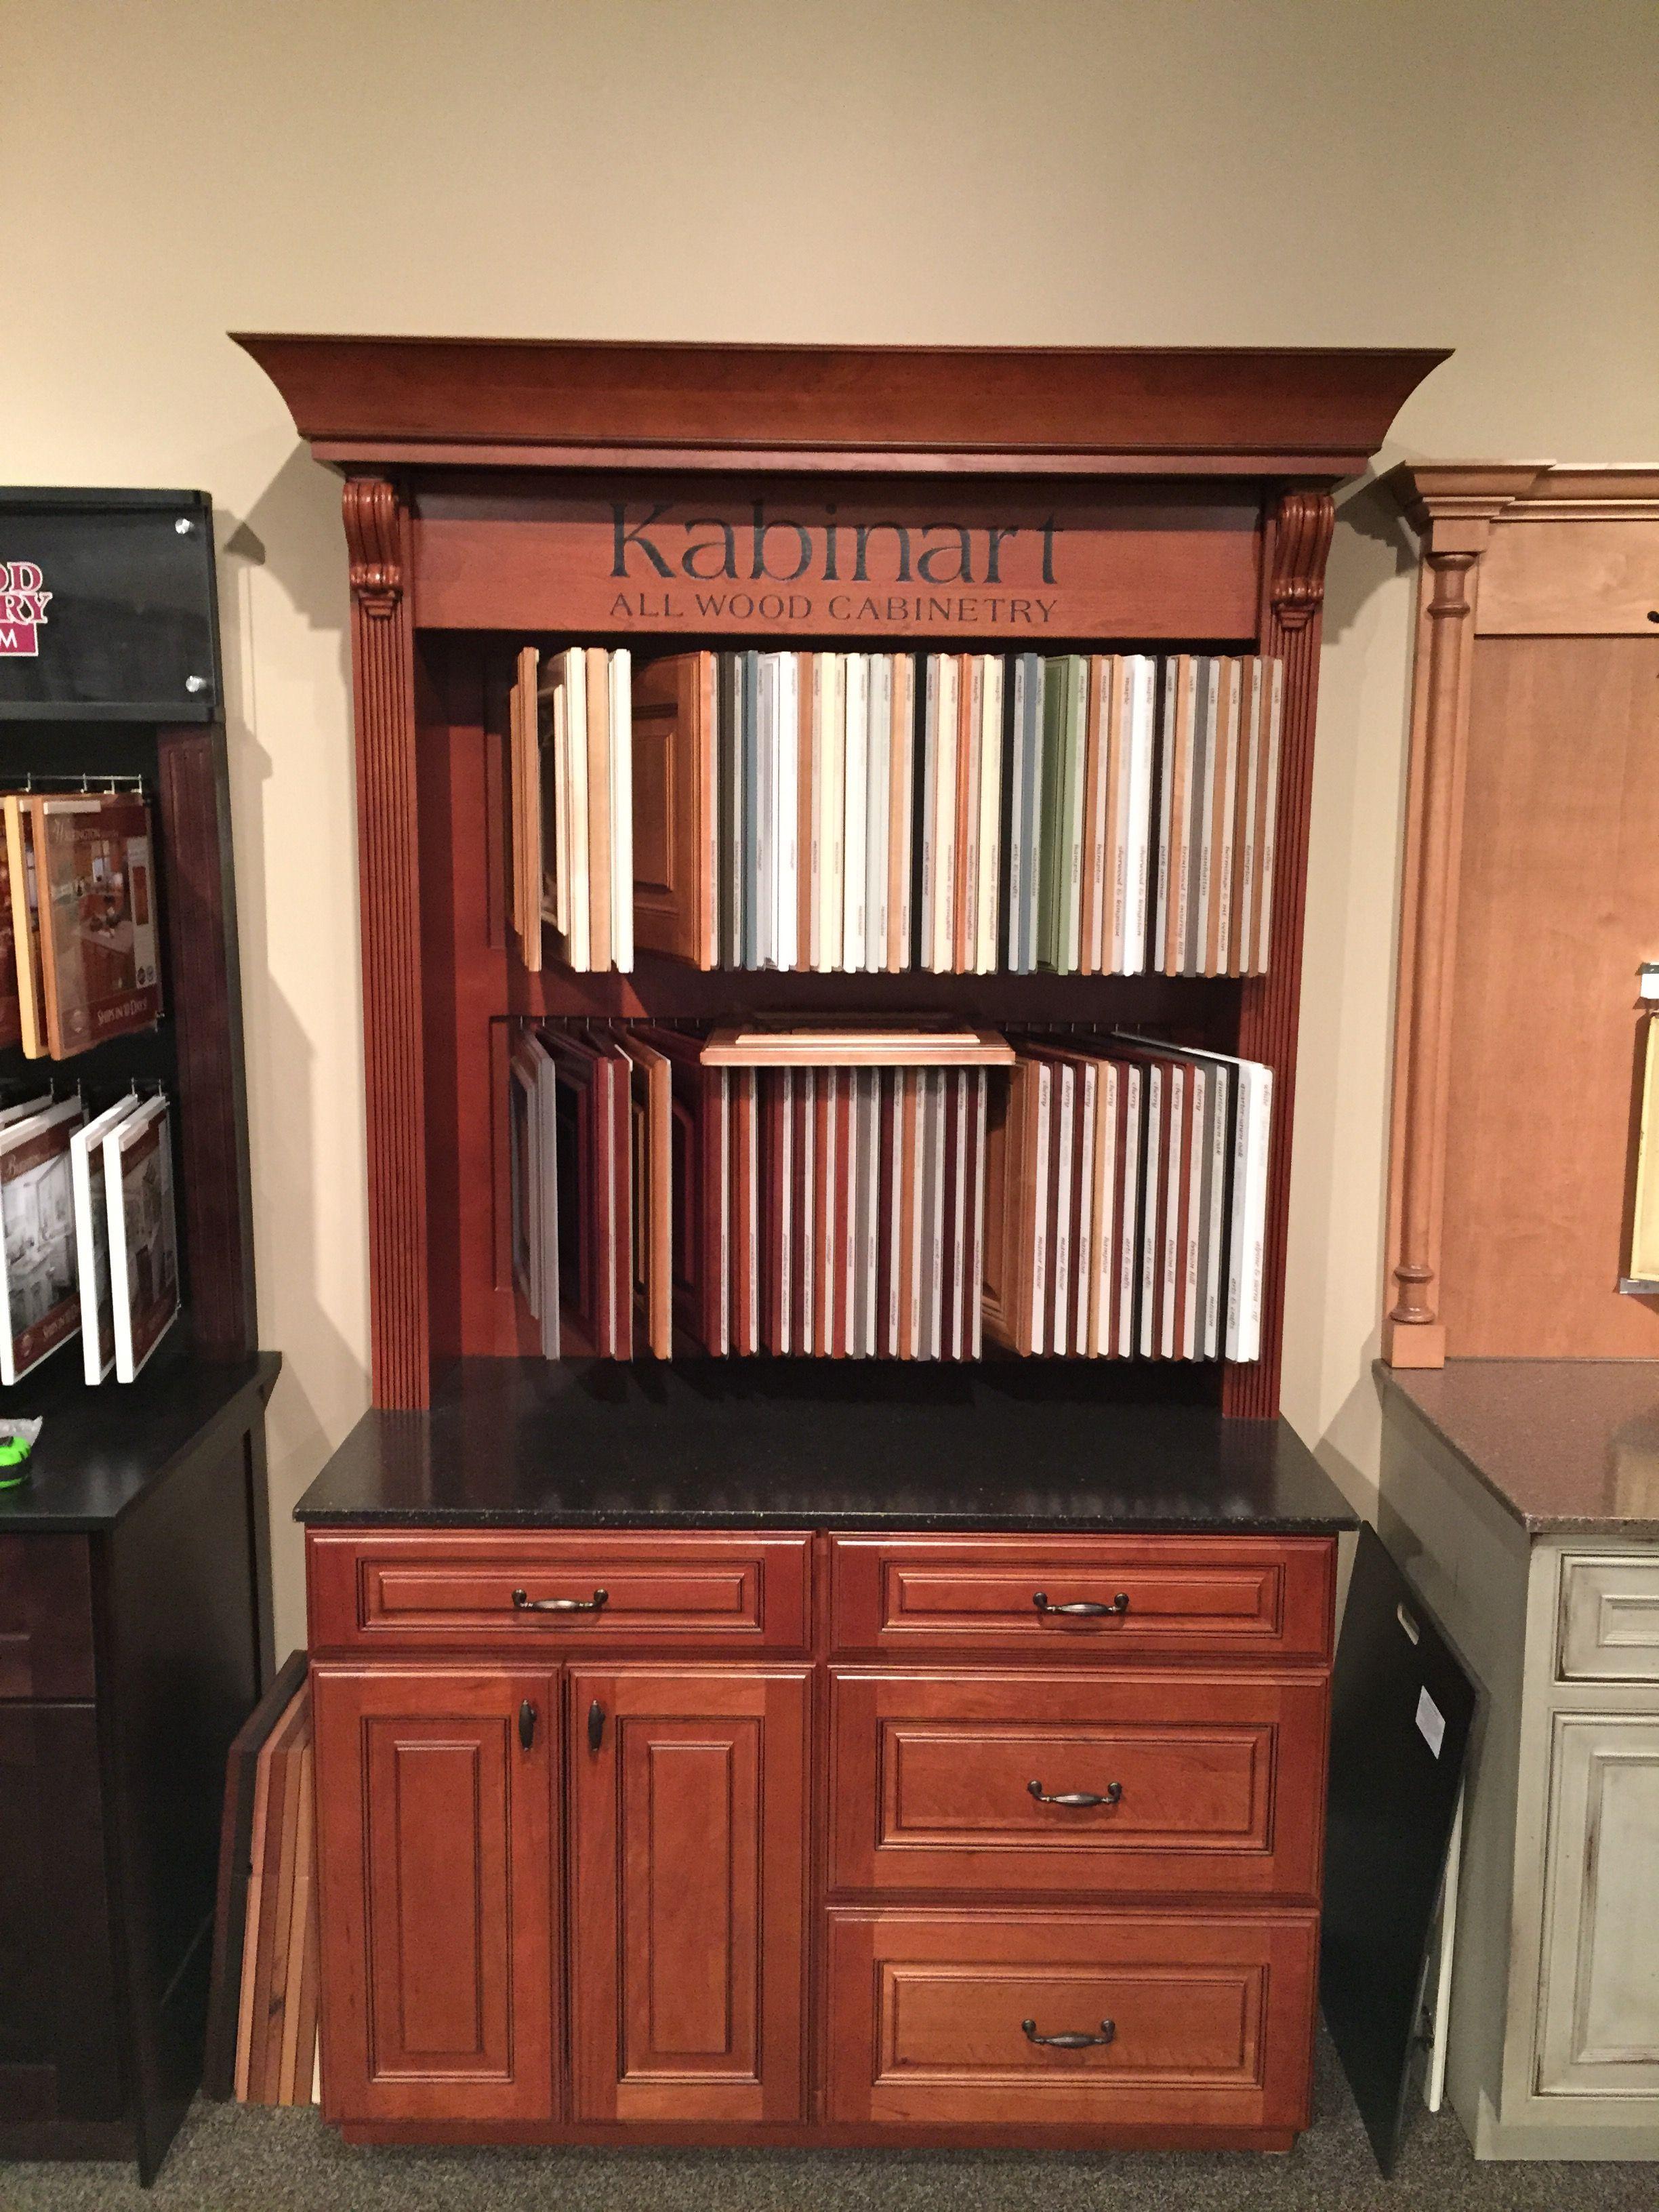 Kabinart Cabinets